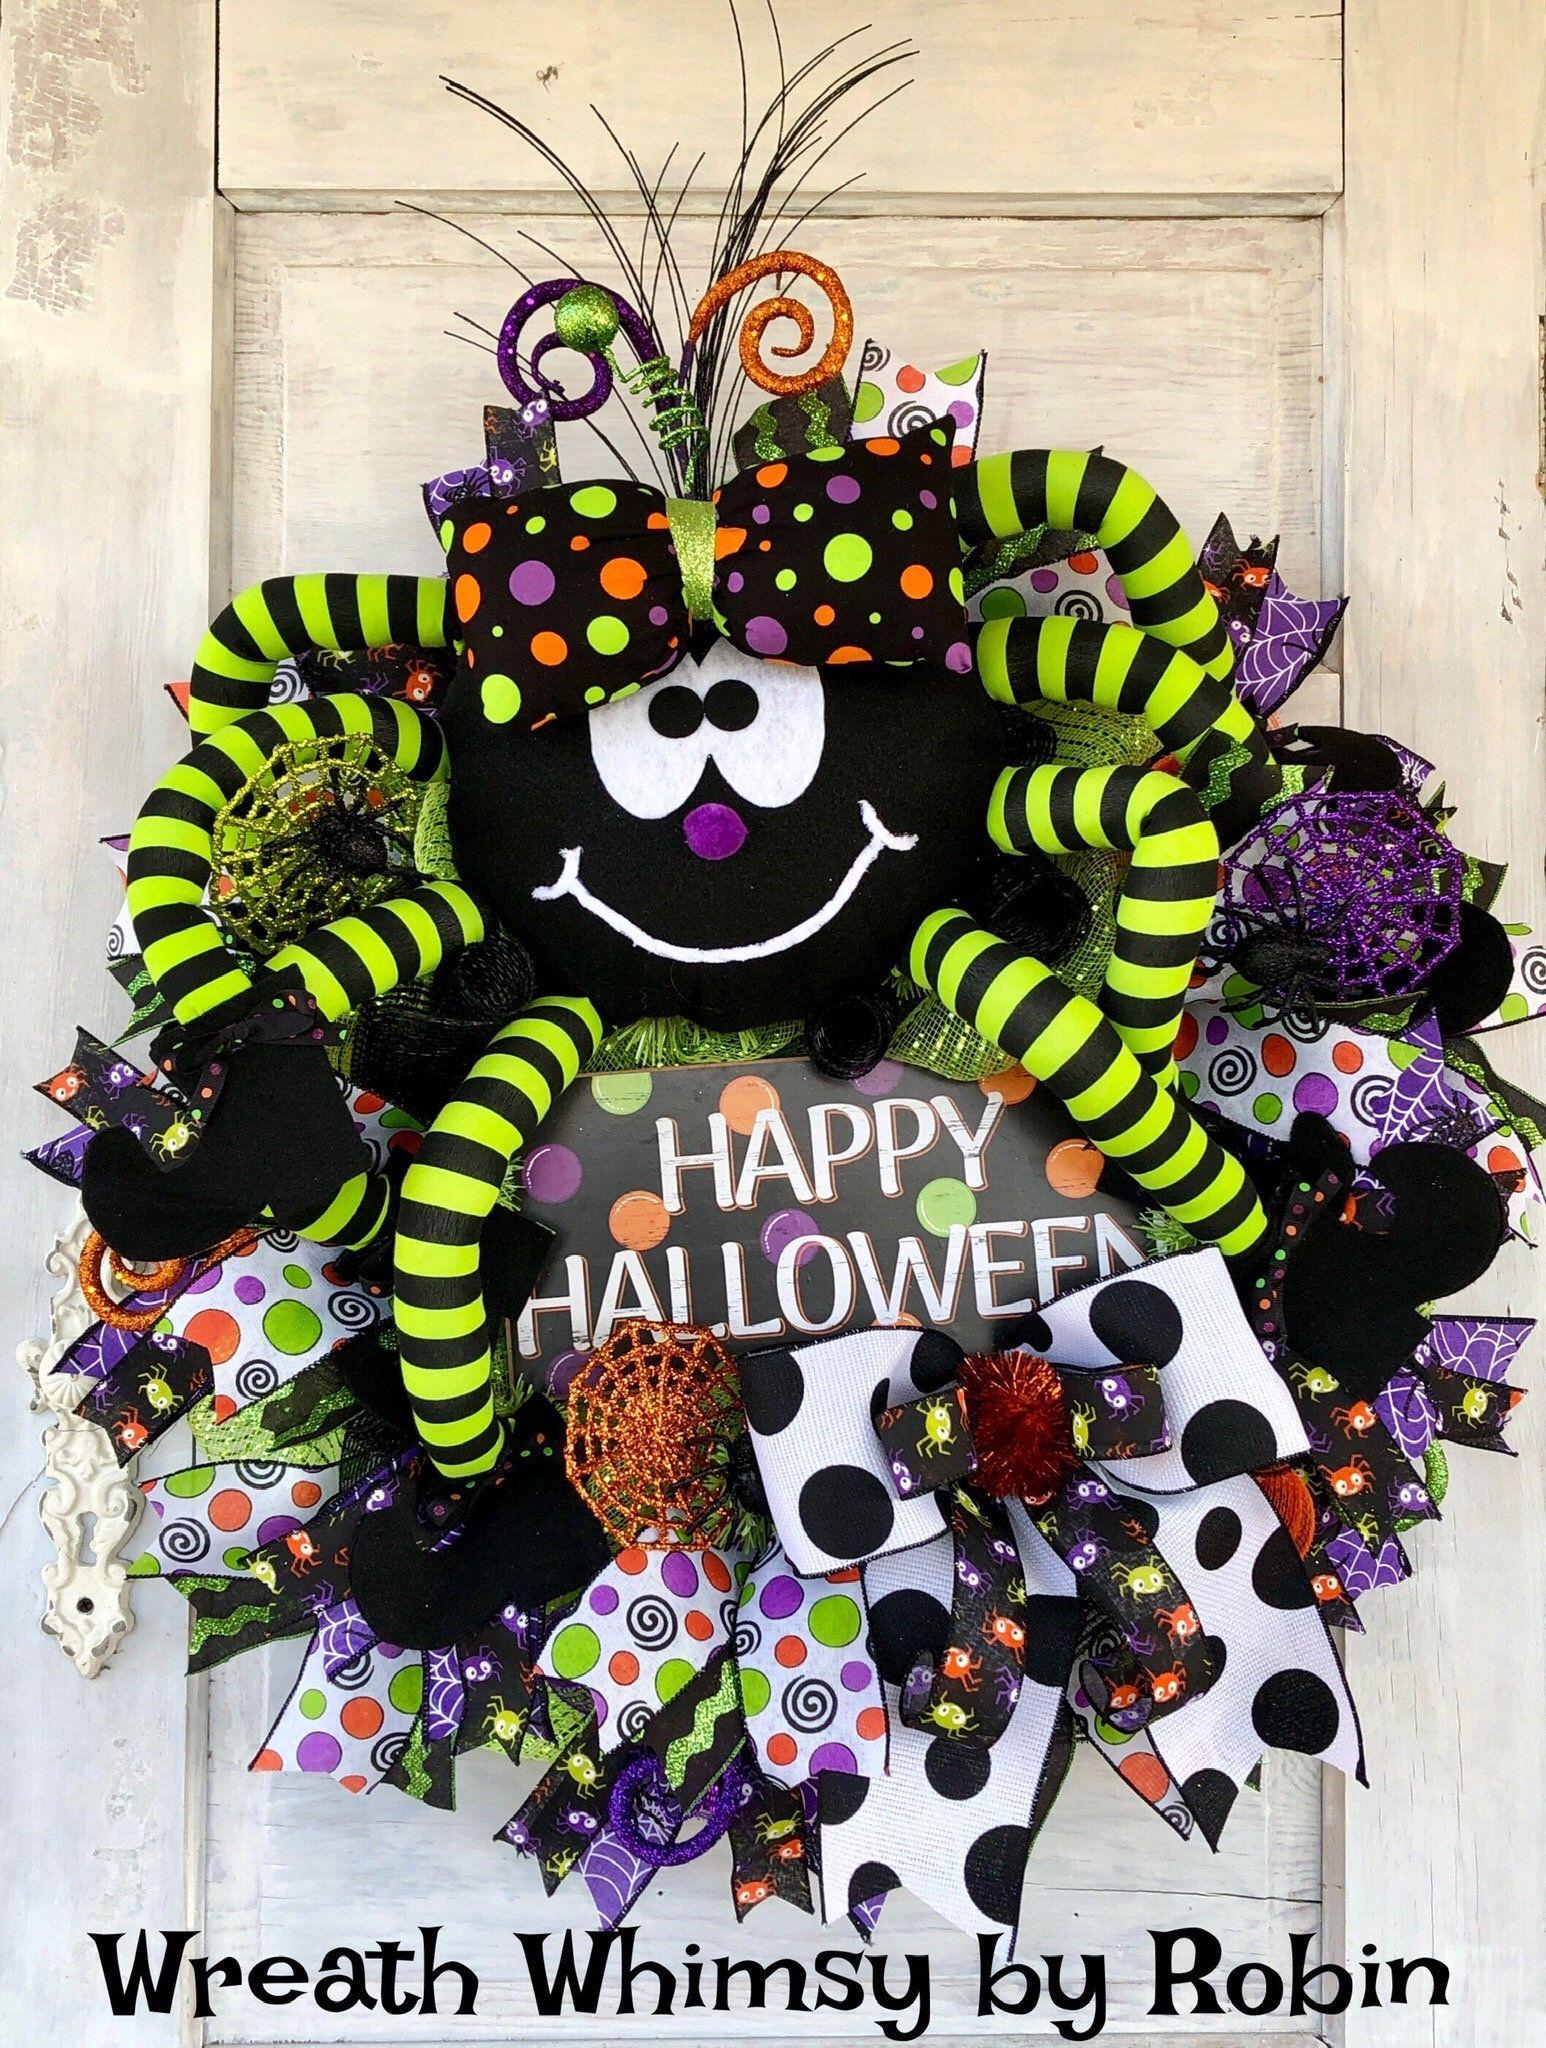 Scary Wreath Halloween Party Decor Spider Wreath Halloween Halloween Wreath Halloween Office Decor Light up wreath Black mesh wreath